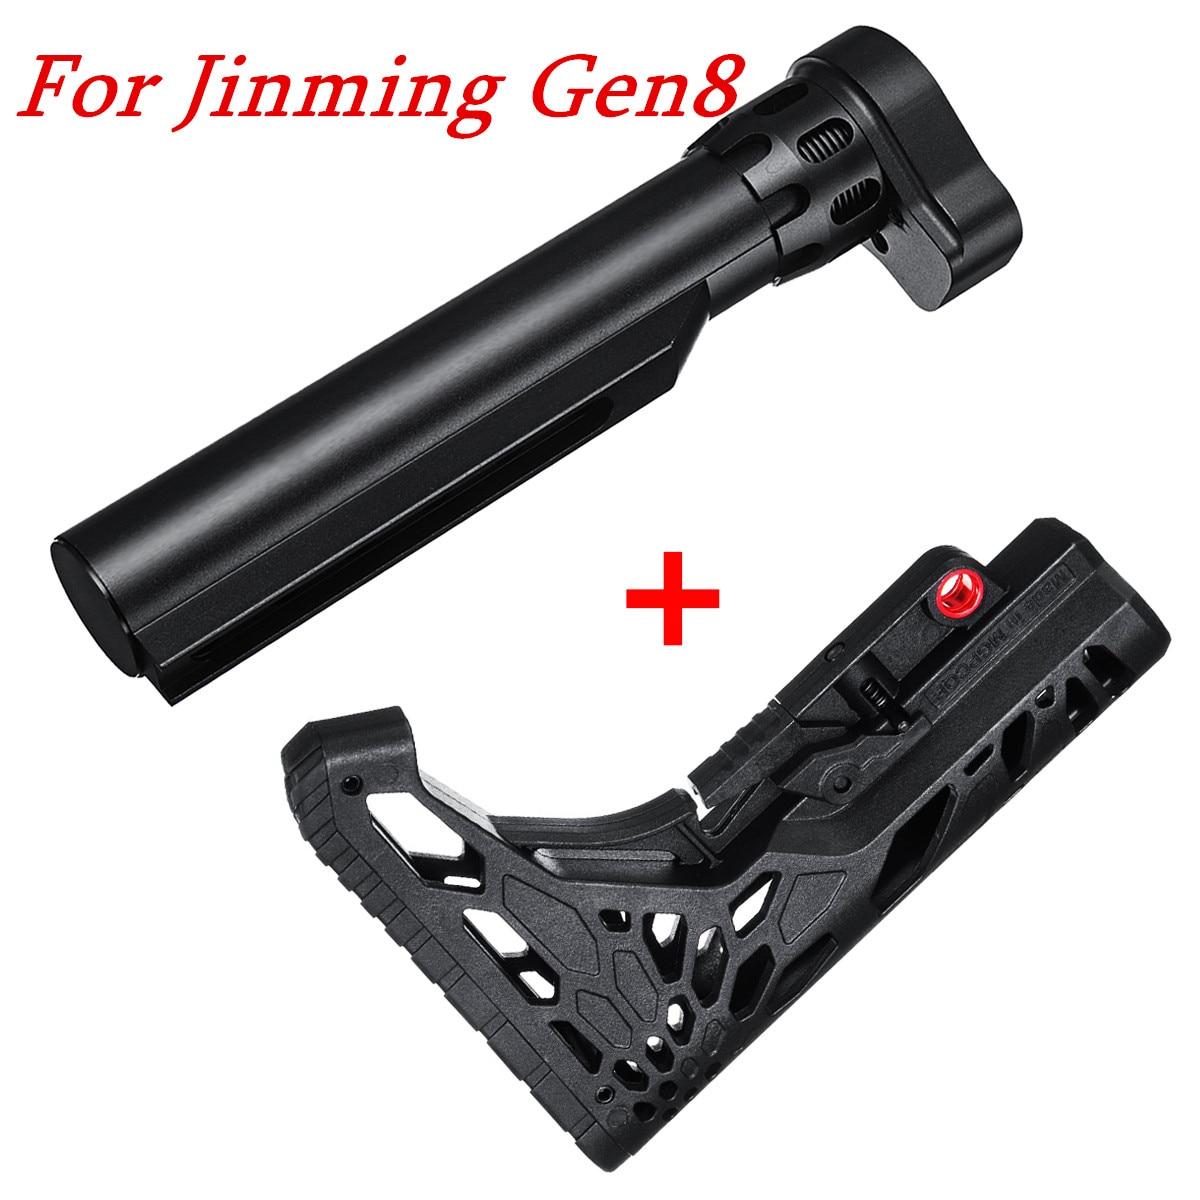 Upgrade Metal Buffer Tube+Pro Nylon Stock Kit for M4A1 Gen8 Gel Blasters Toy Guns c